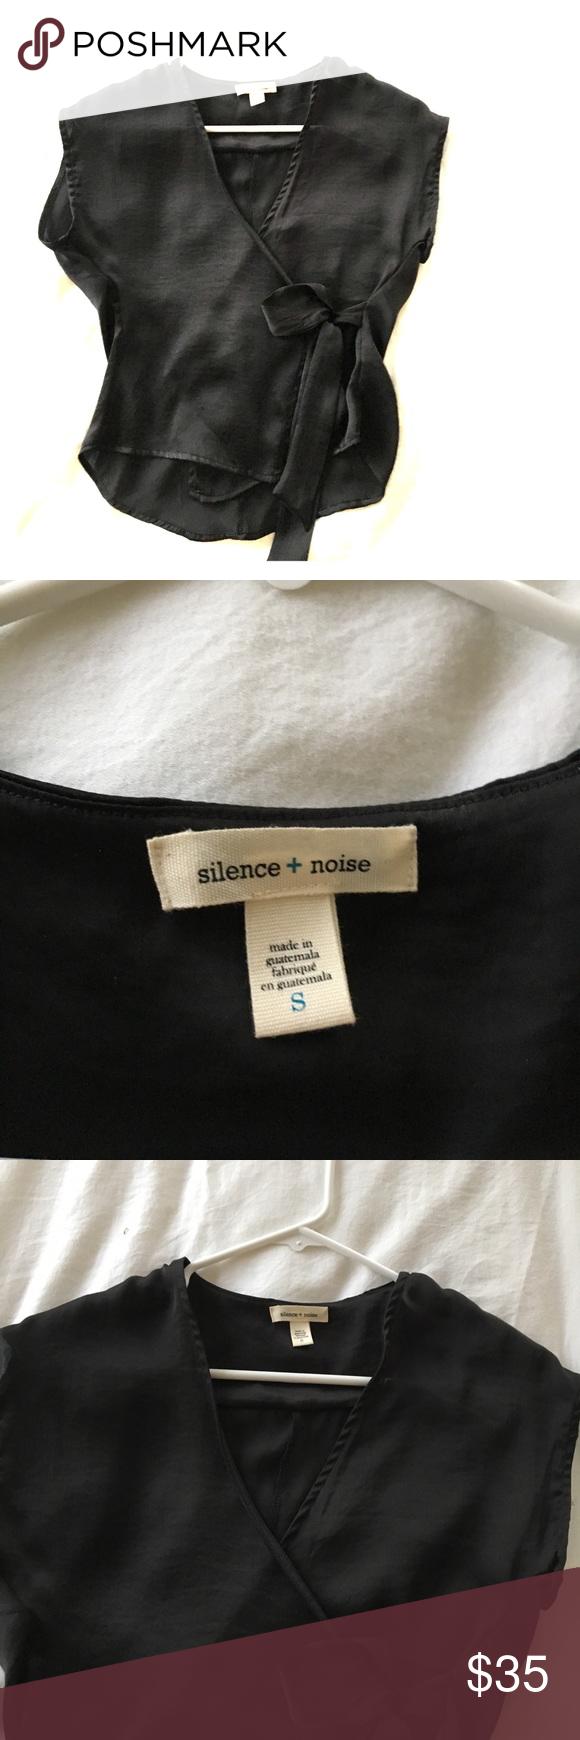 b75228c0395bd Silence and noise silk wrap blouse Urban outfitters silence and noise black  silk sleek wrap top